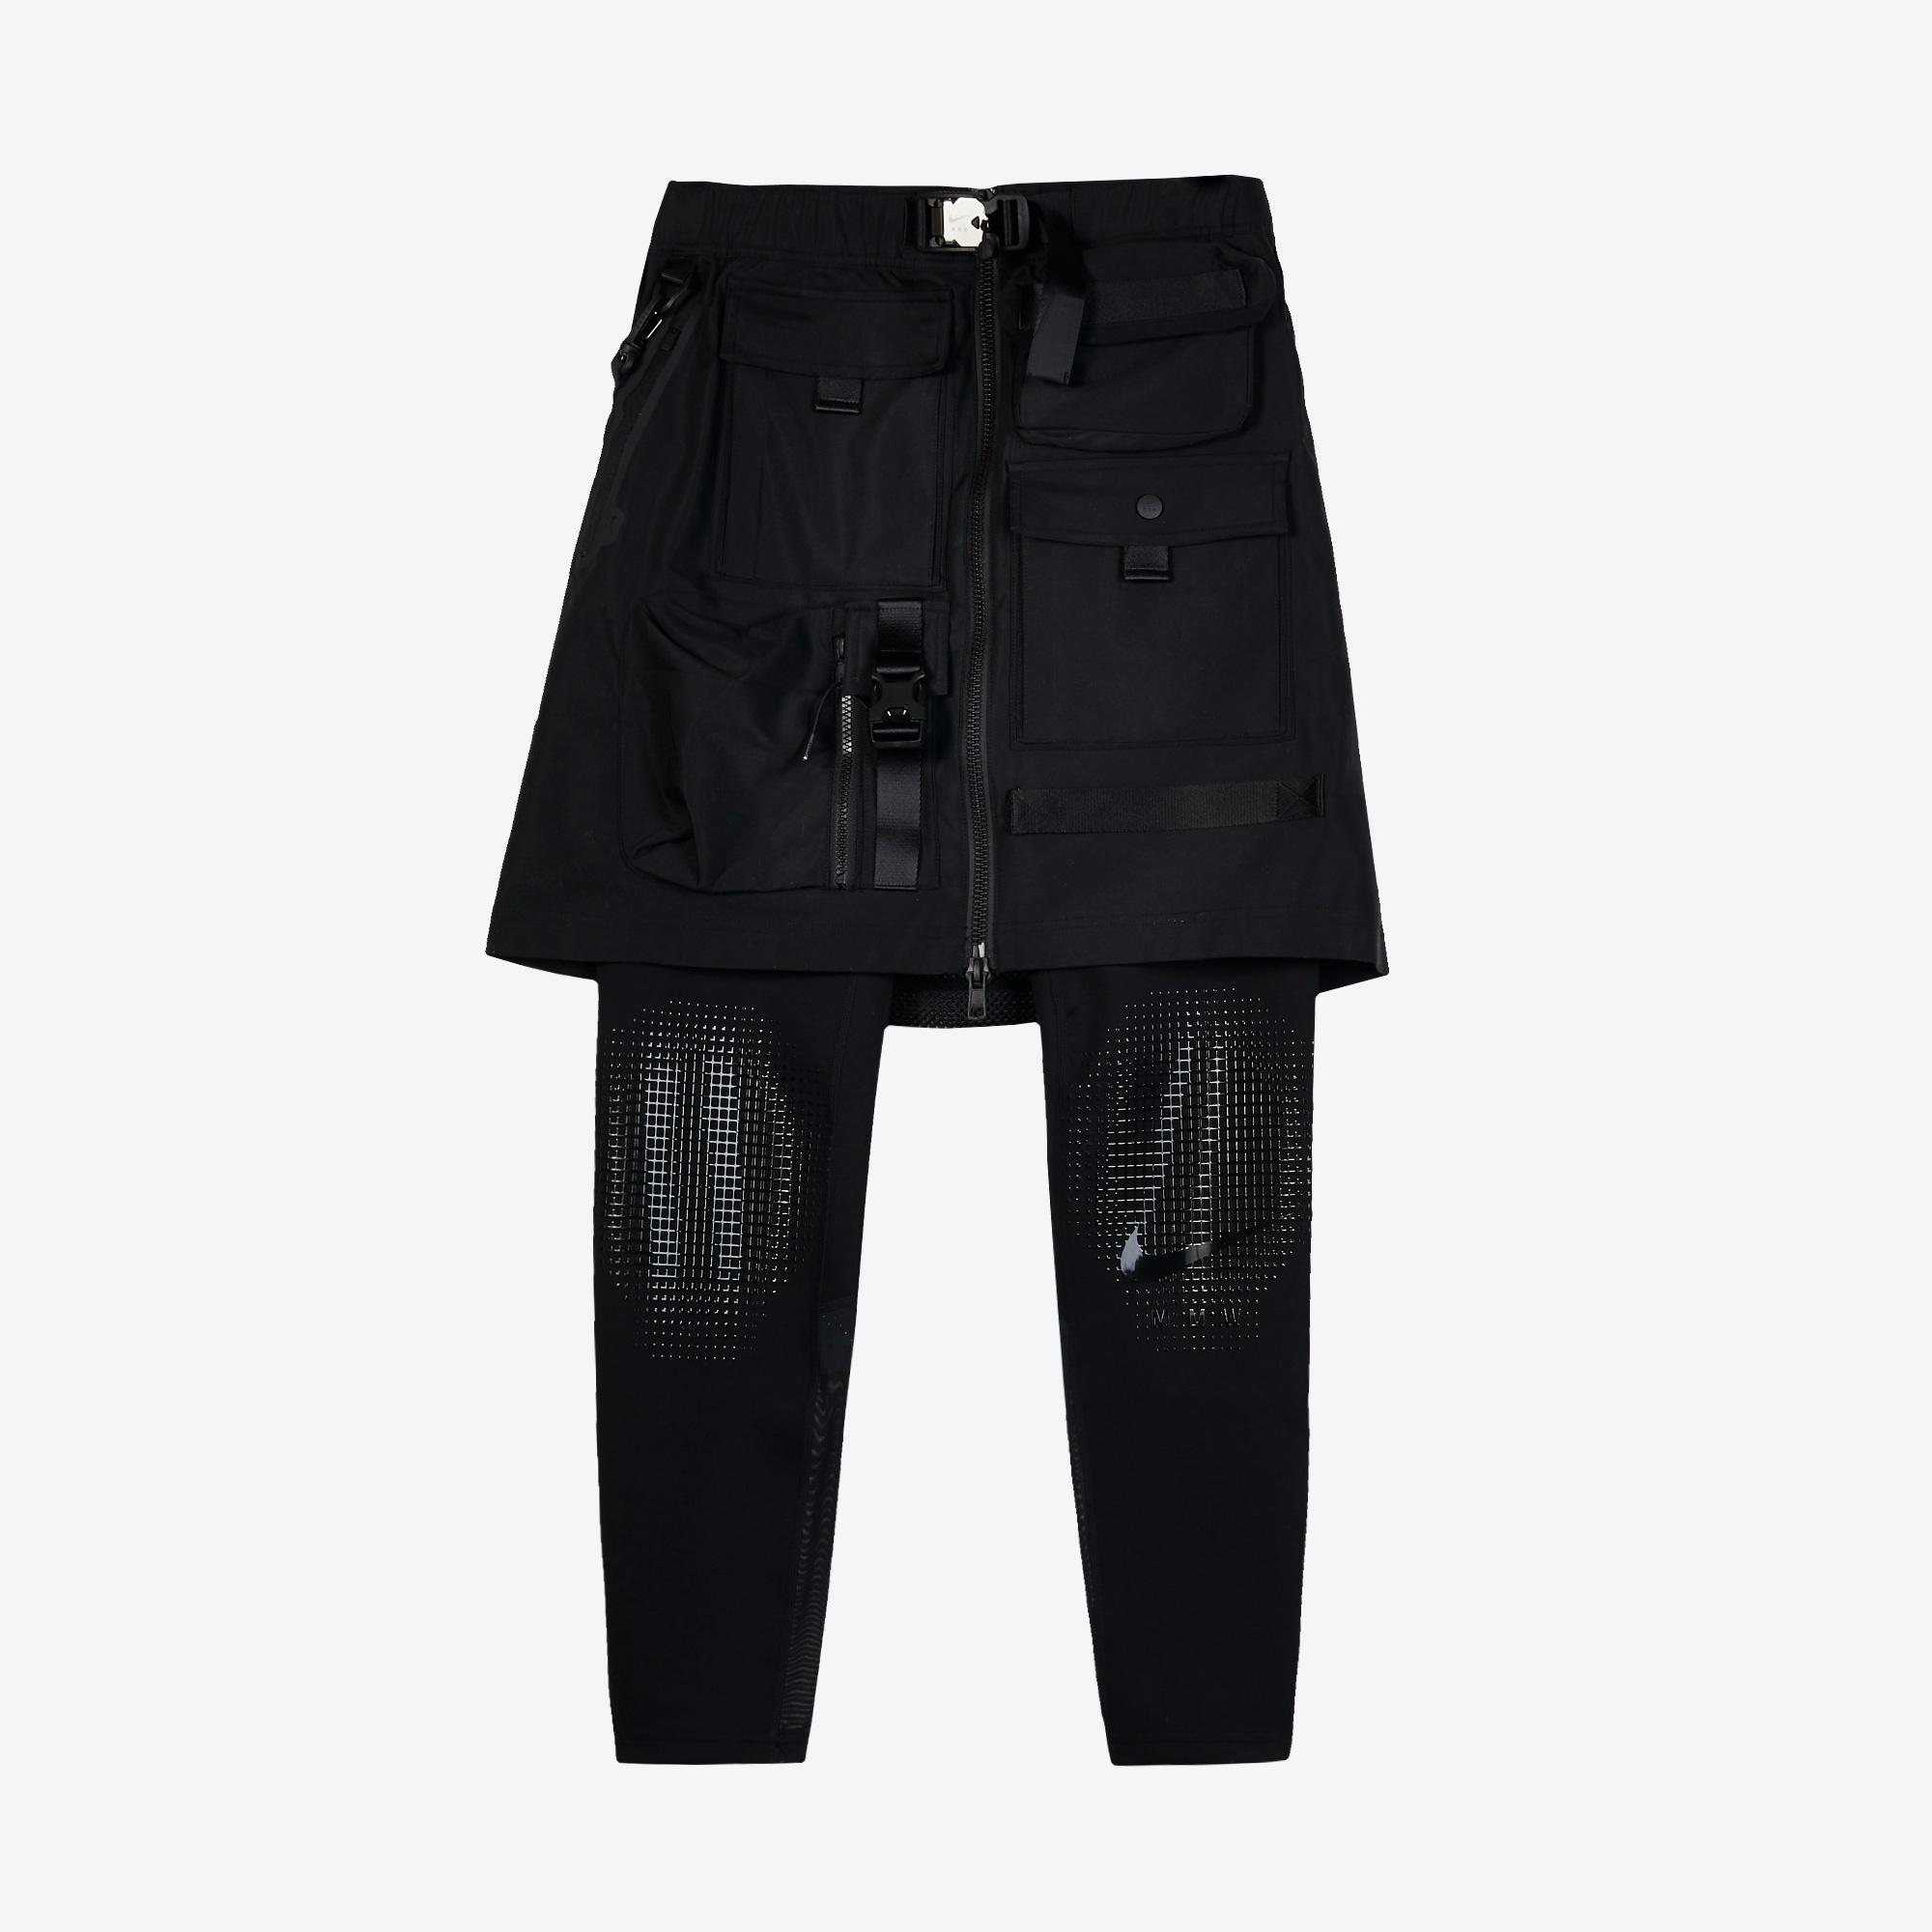 69f72dea9c510 Nike 2-In-1 Skirt x MMW - Ar5618-010 - Sneakersnstuff